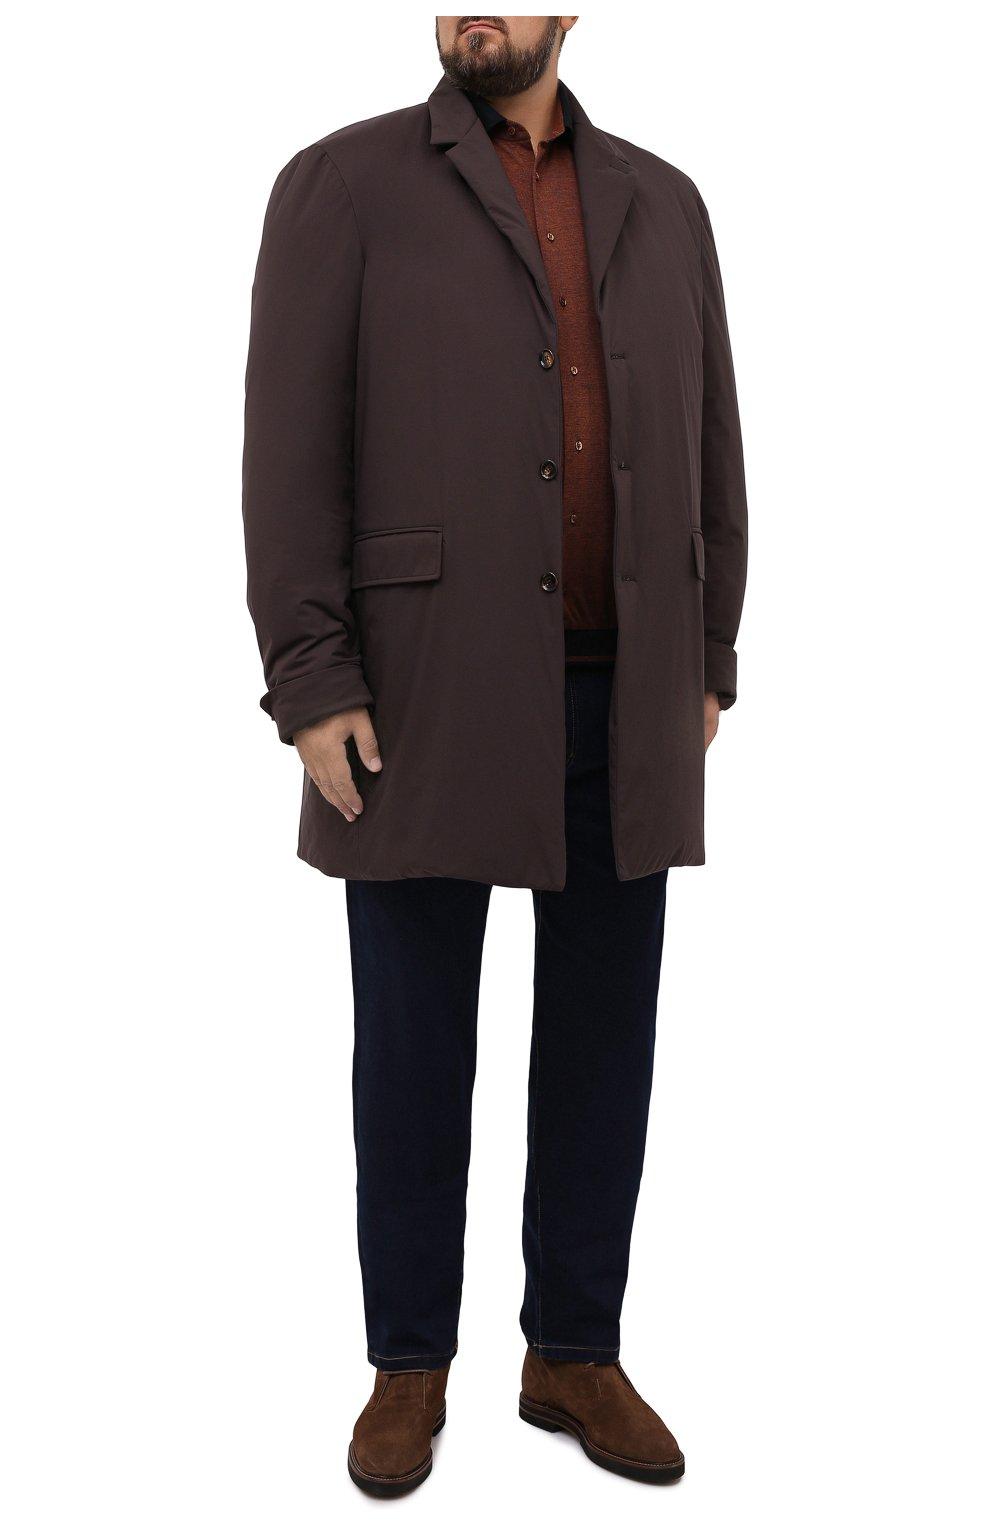 Мужской пуховый плащ KIRED коричневого цвета, арт. WPELM0LW6806527000/62-72 | Фото 2